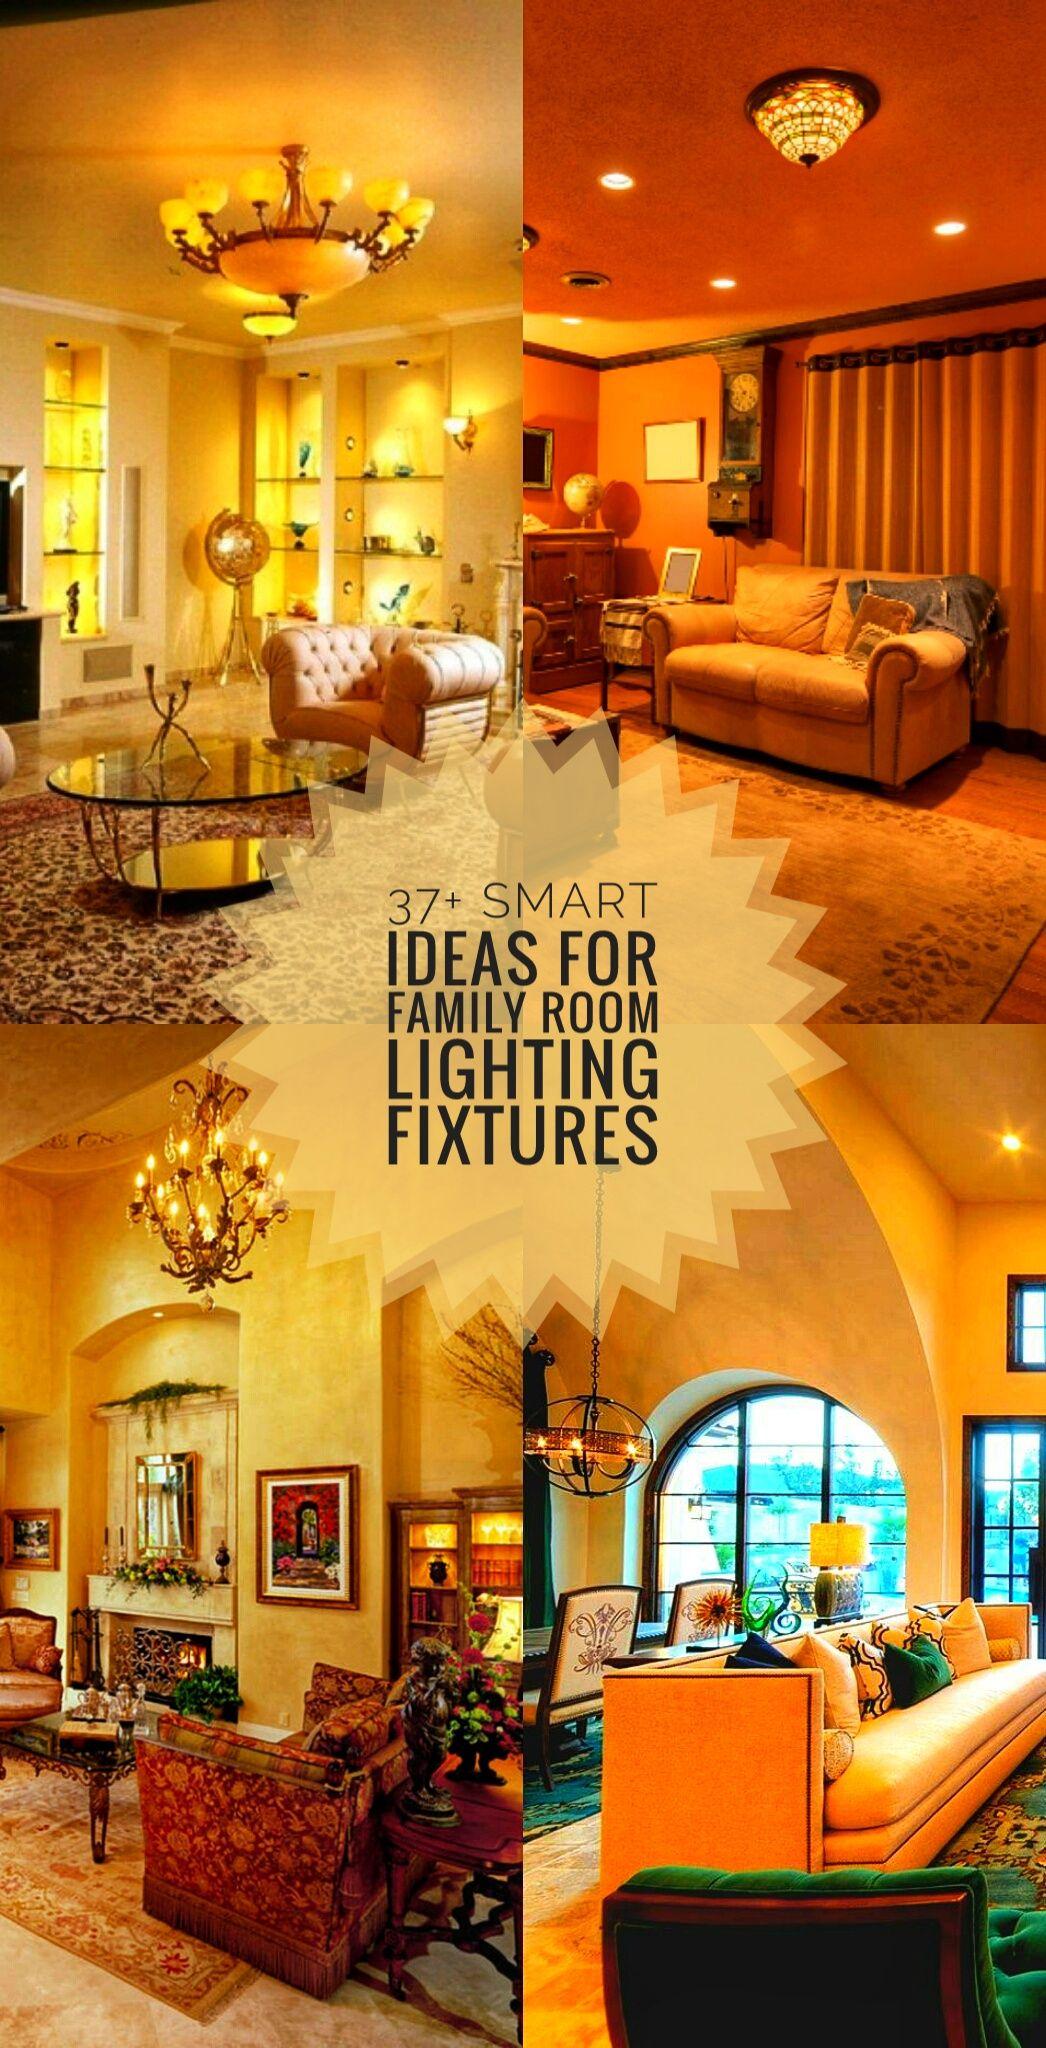 37 smart ideas for family room lighting fixtures familyroomlighting